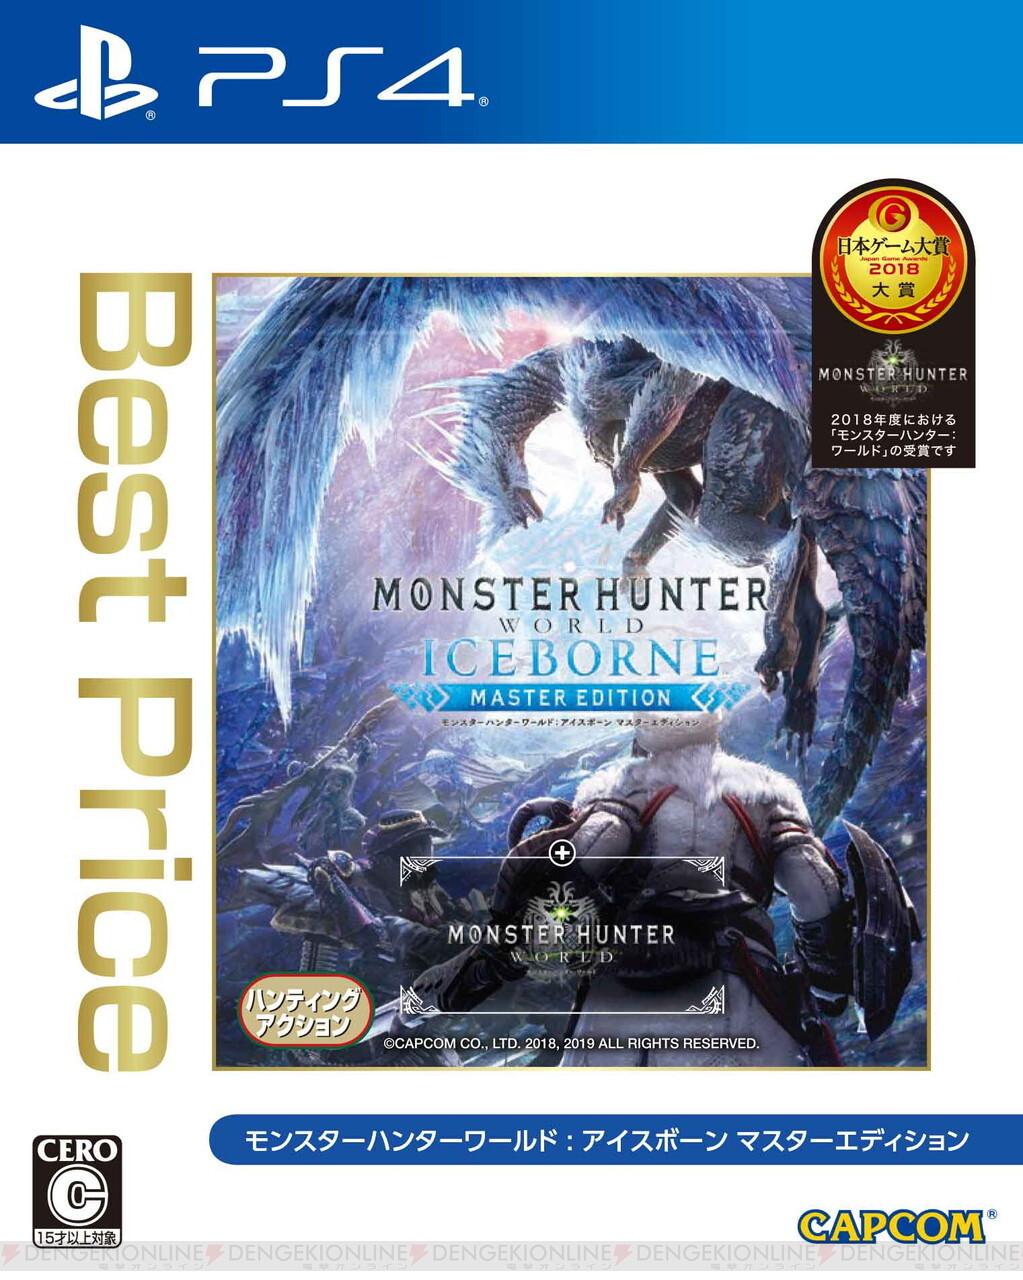 PS4版『モンハンワールド:アイスボーン』がお得な価格に - 電撃オンライン